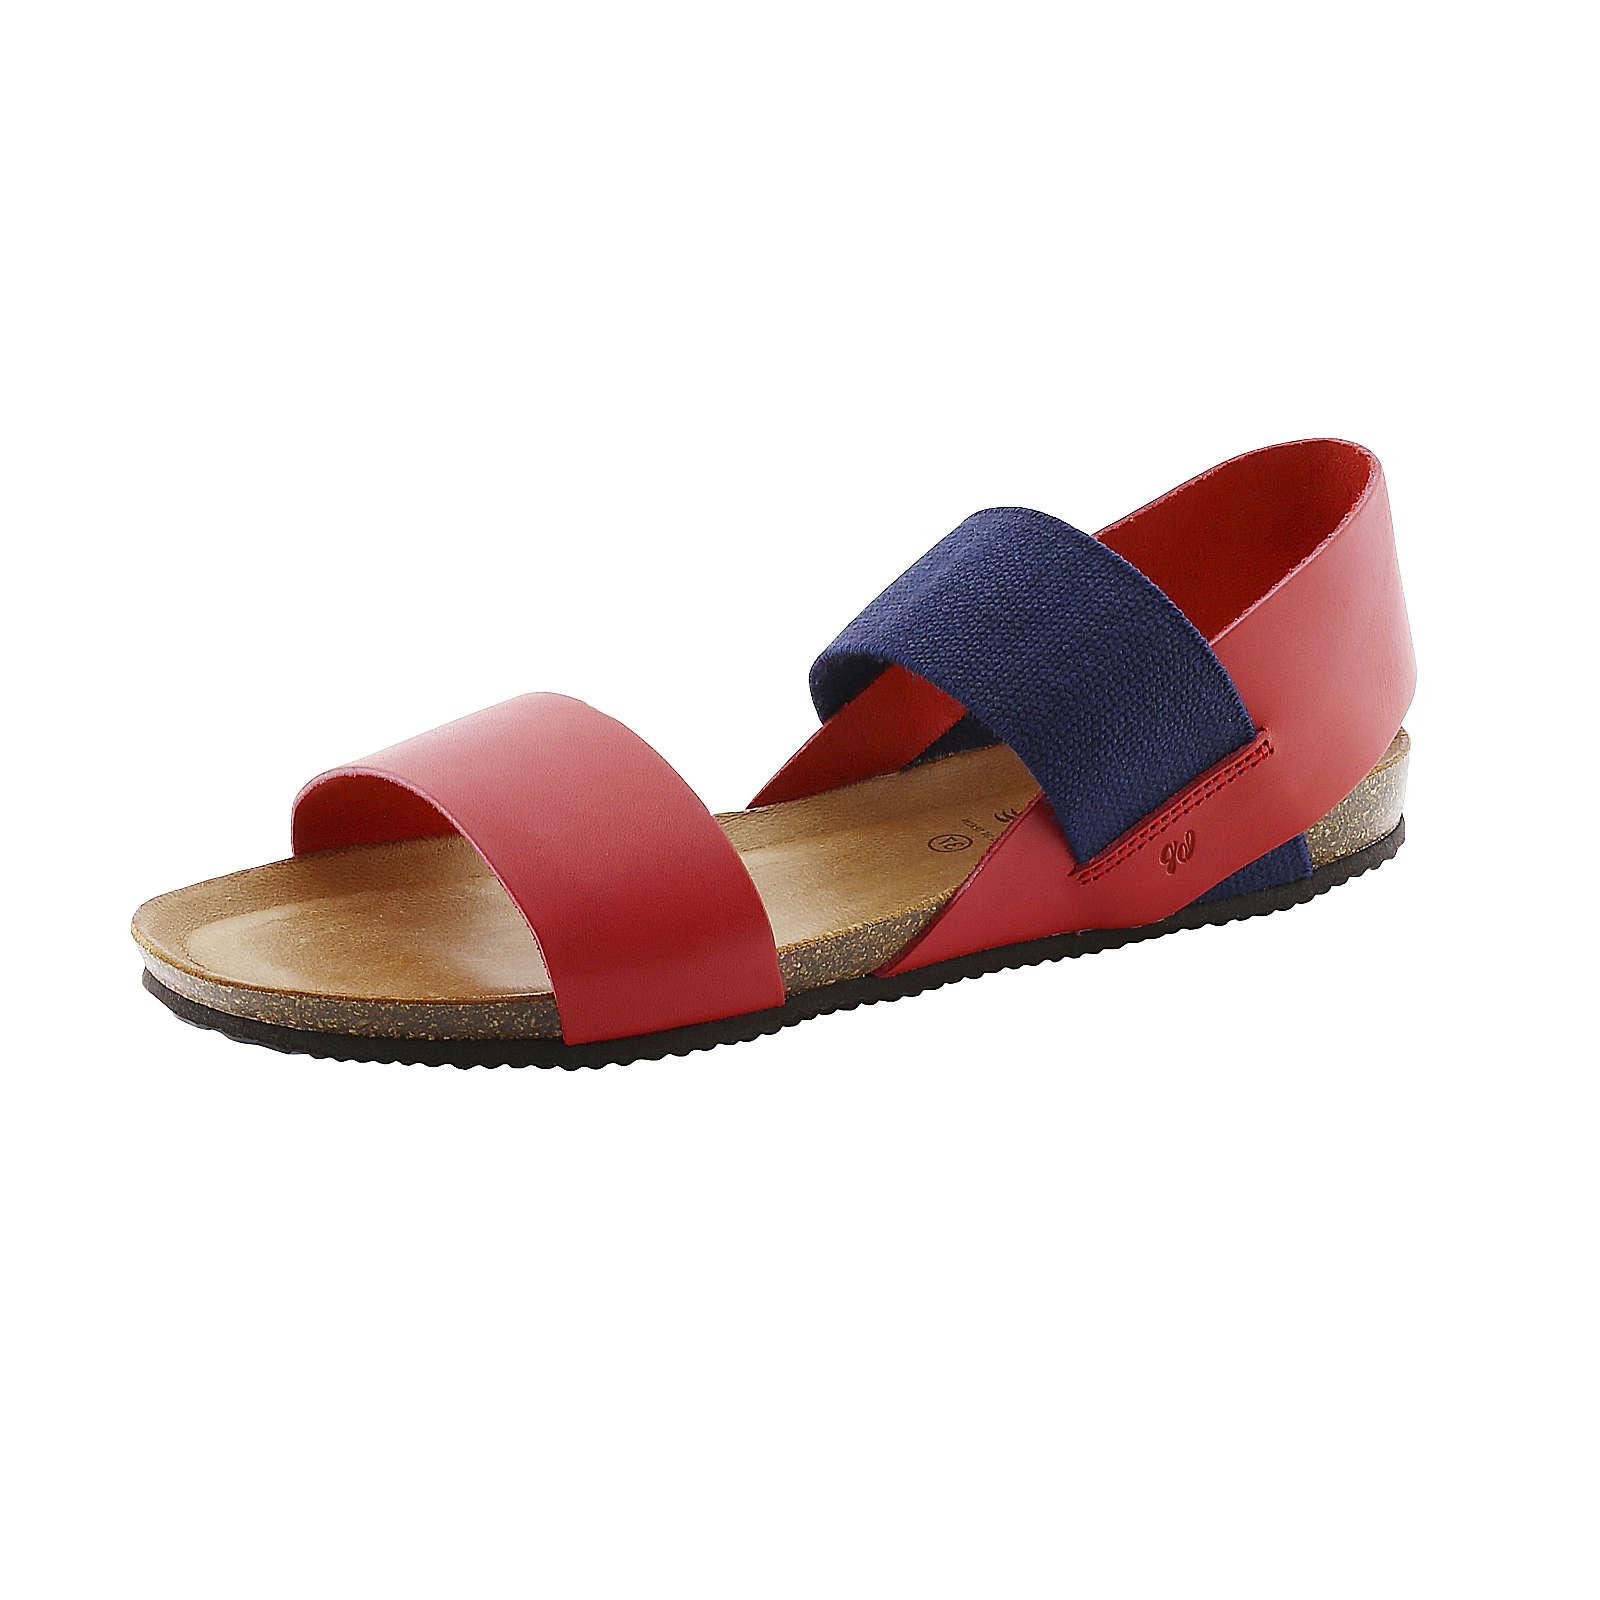 Bearpaw Sandalette BIANCA Klassische Sandalen rot Damen Gr. 38